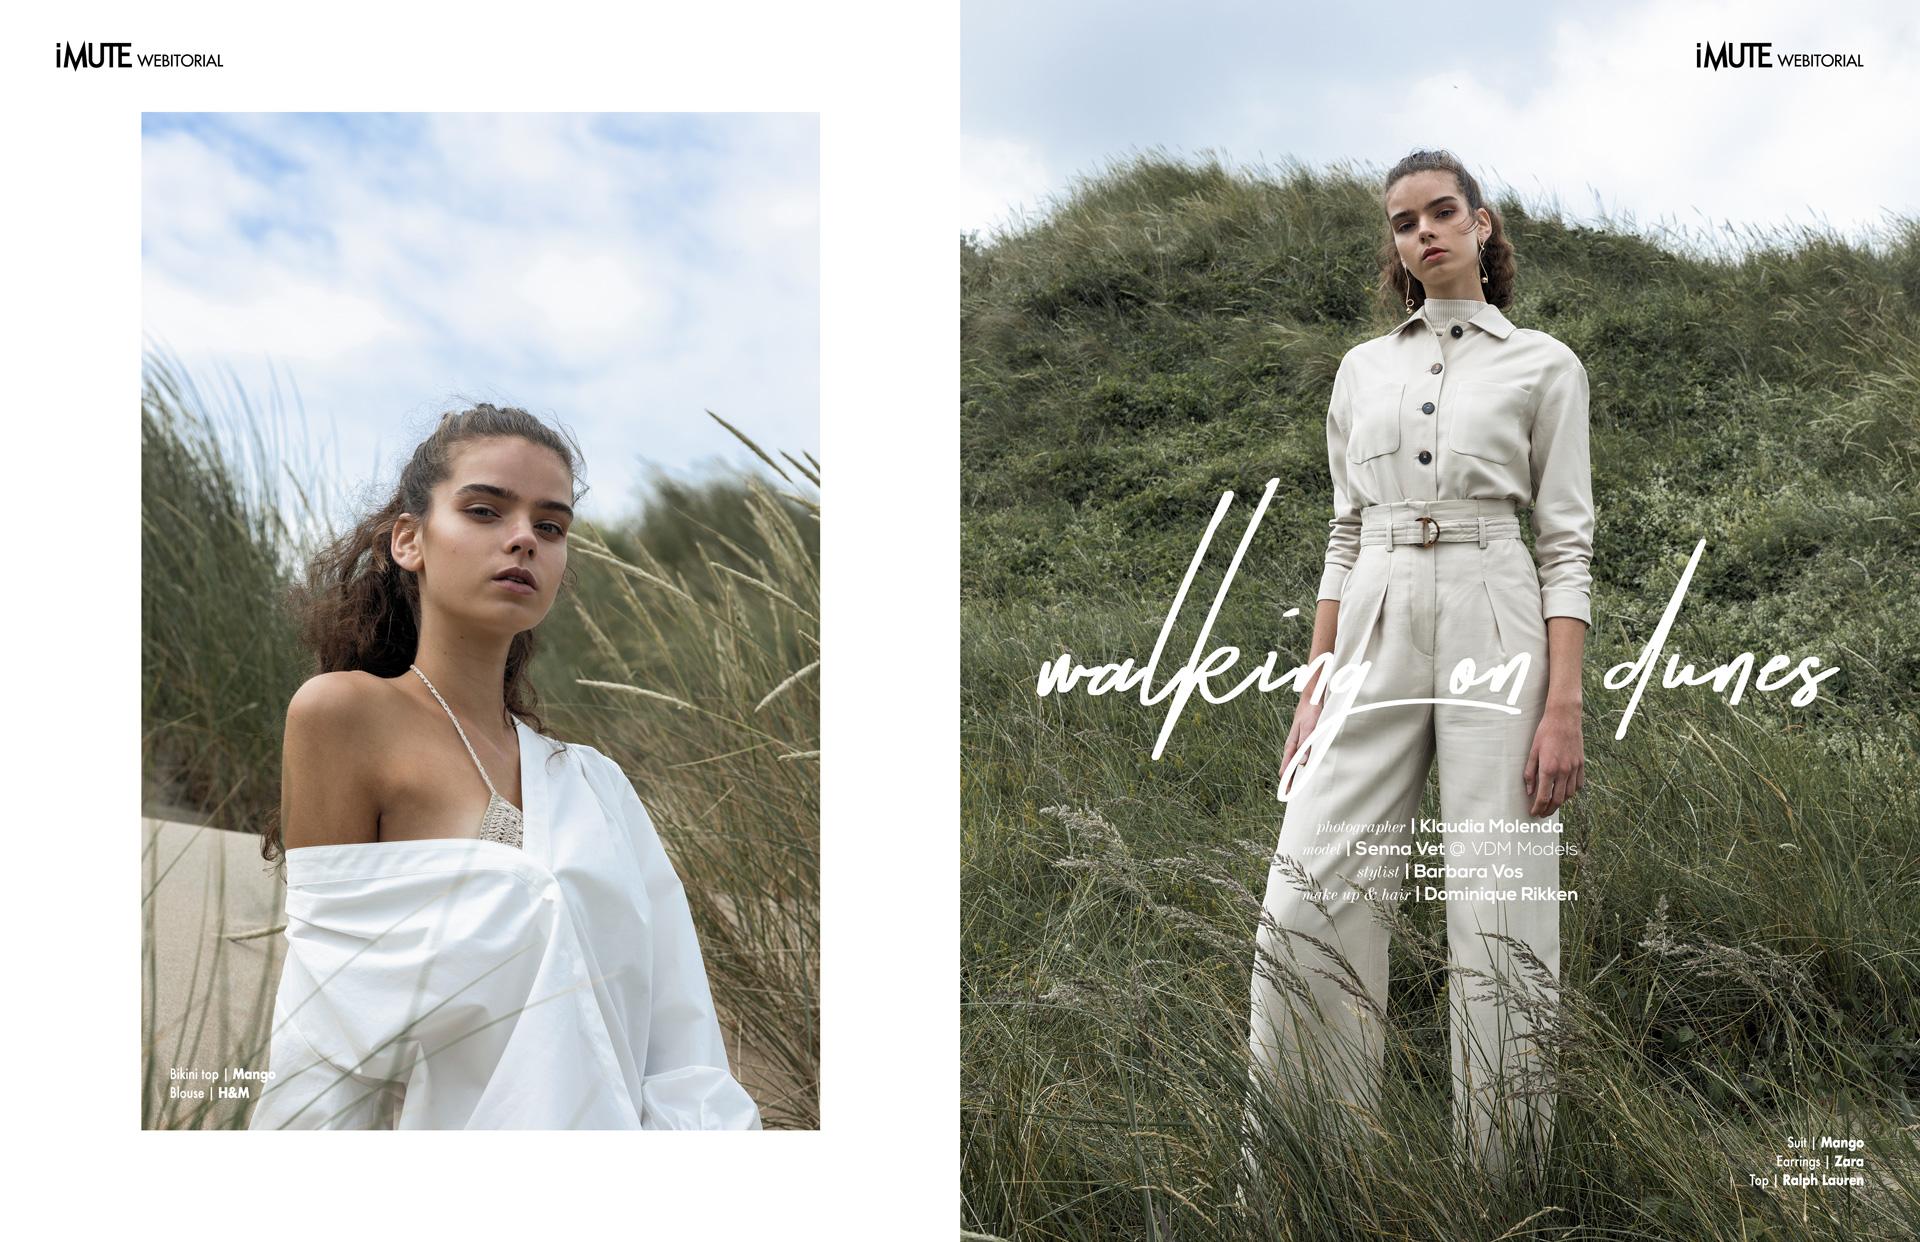 Walking on dunes webitorial for iMute Magazine  Photographer|Klaudia Molenda Model| Senna Vet @VDM Models Stylist|Barbara Vos Makeup & Hair|Dominique Rikken